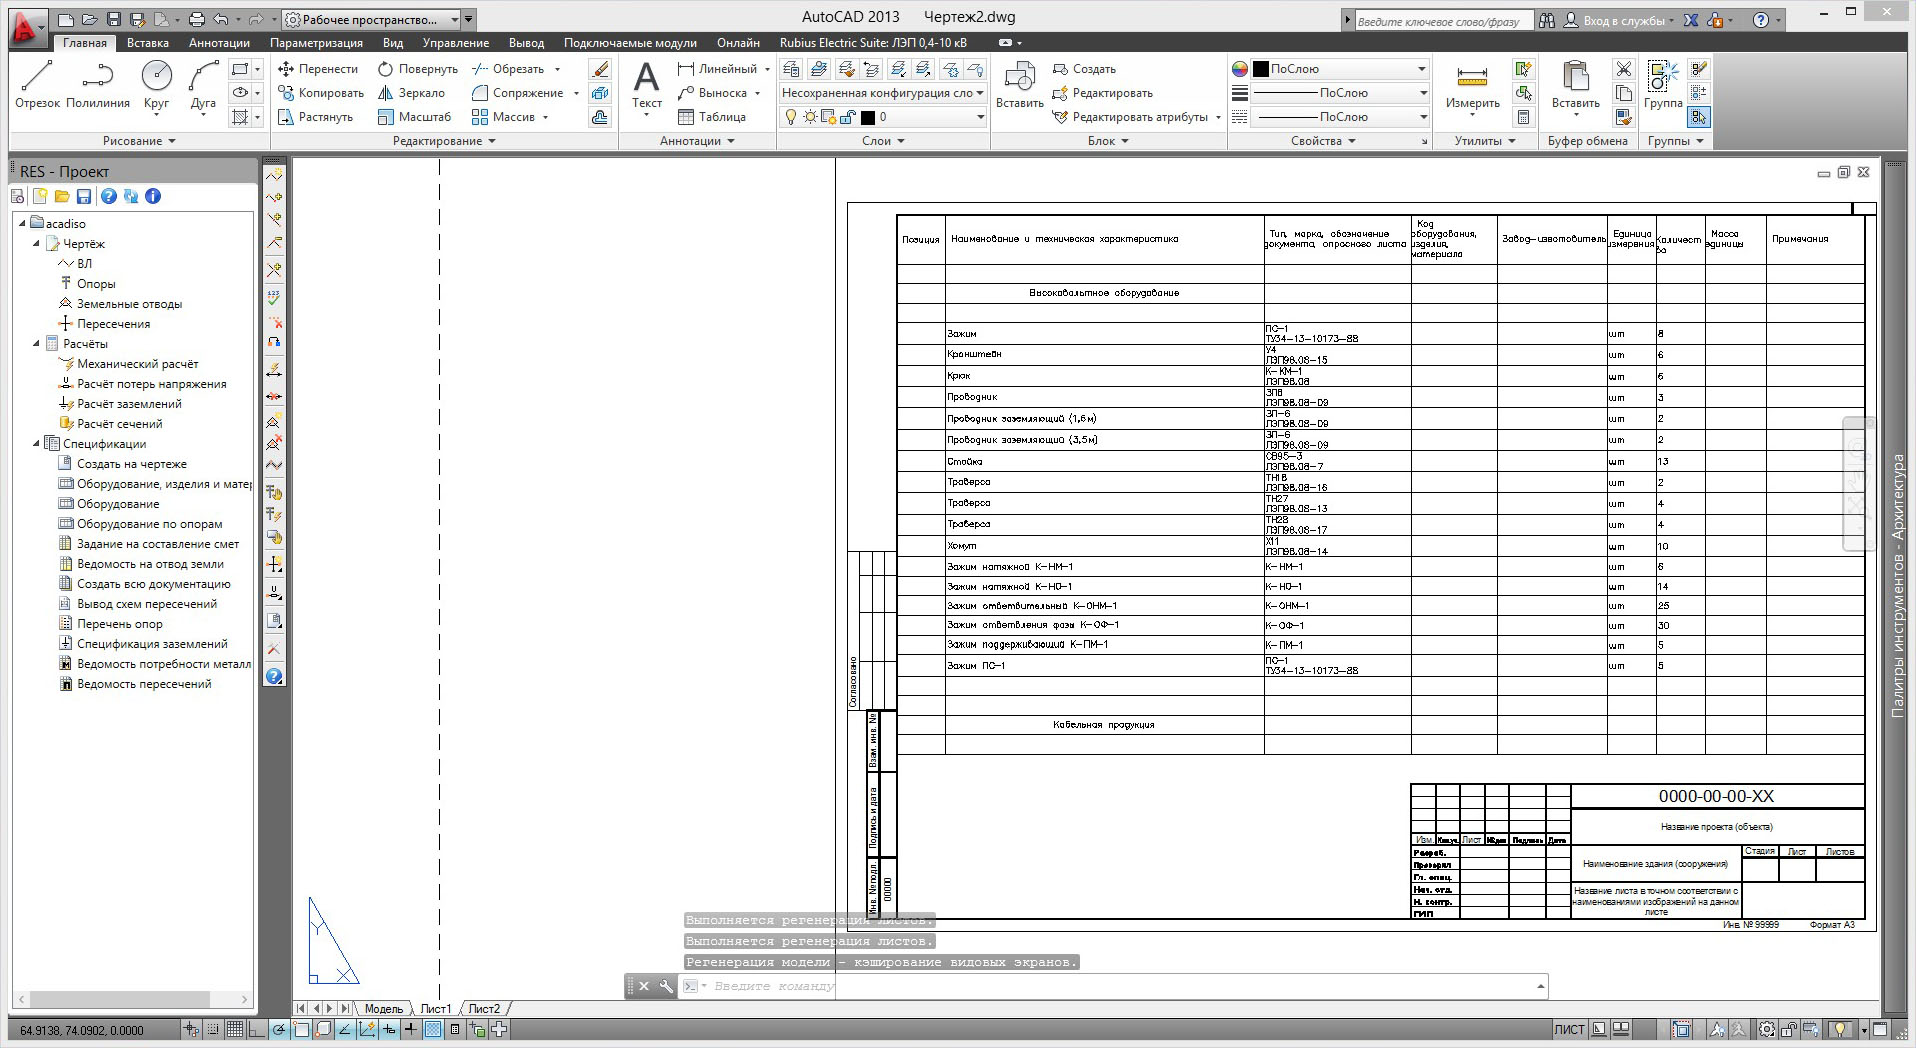 Заказная спецификация, ведомость опор, спецификация оборудования